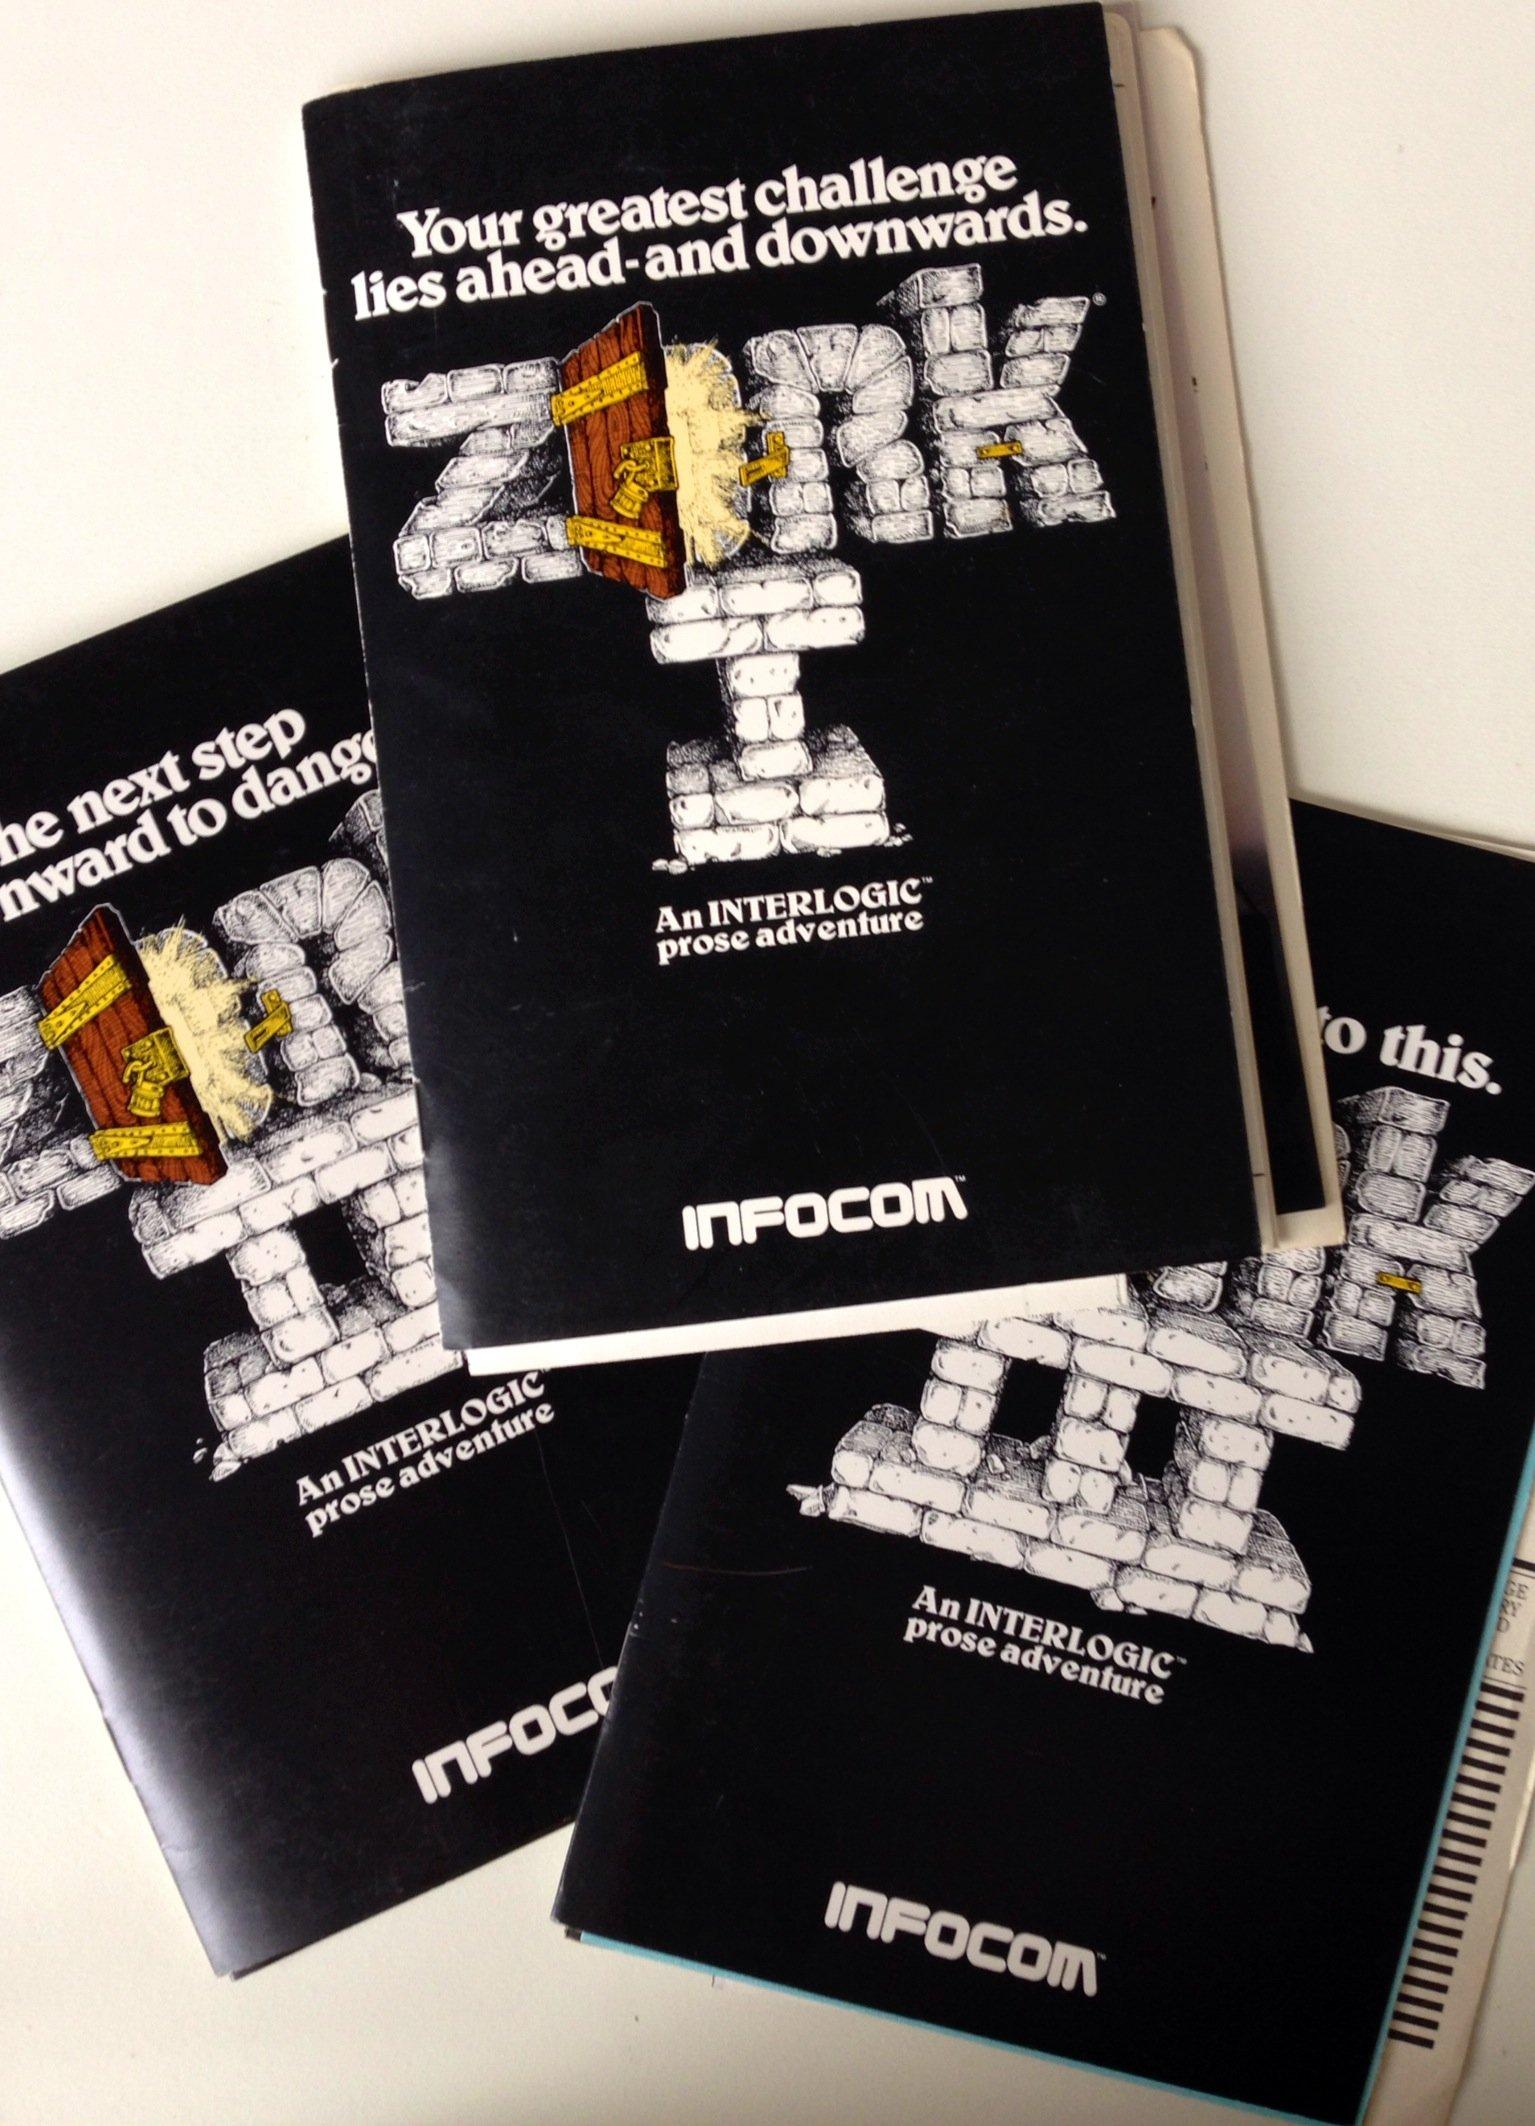 Zork I, II, III Atari/Infocom Game Materials: Infocom